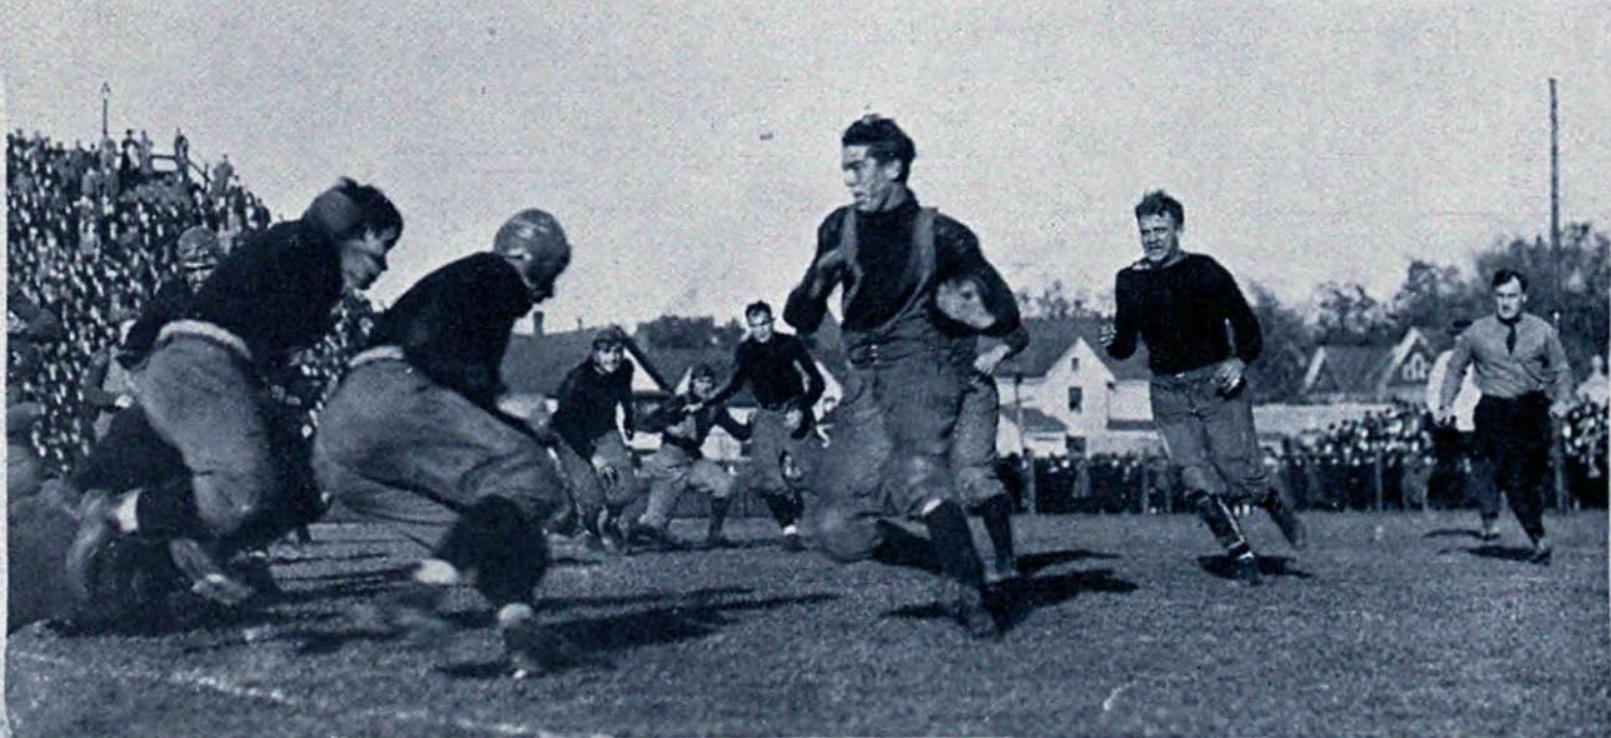 1910 college football season